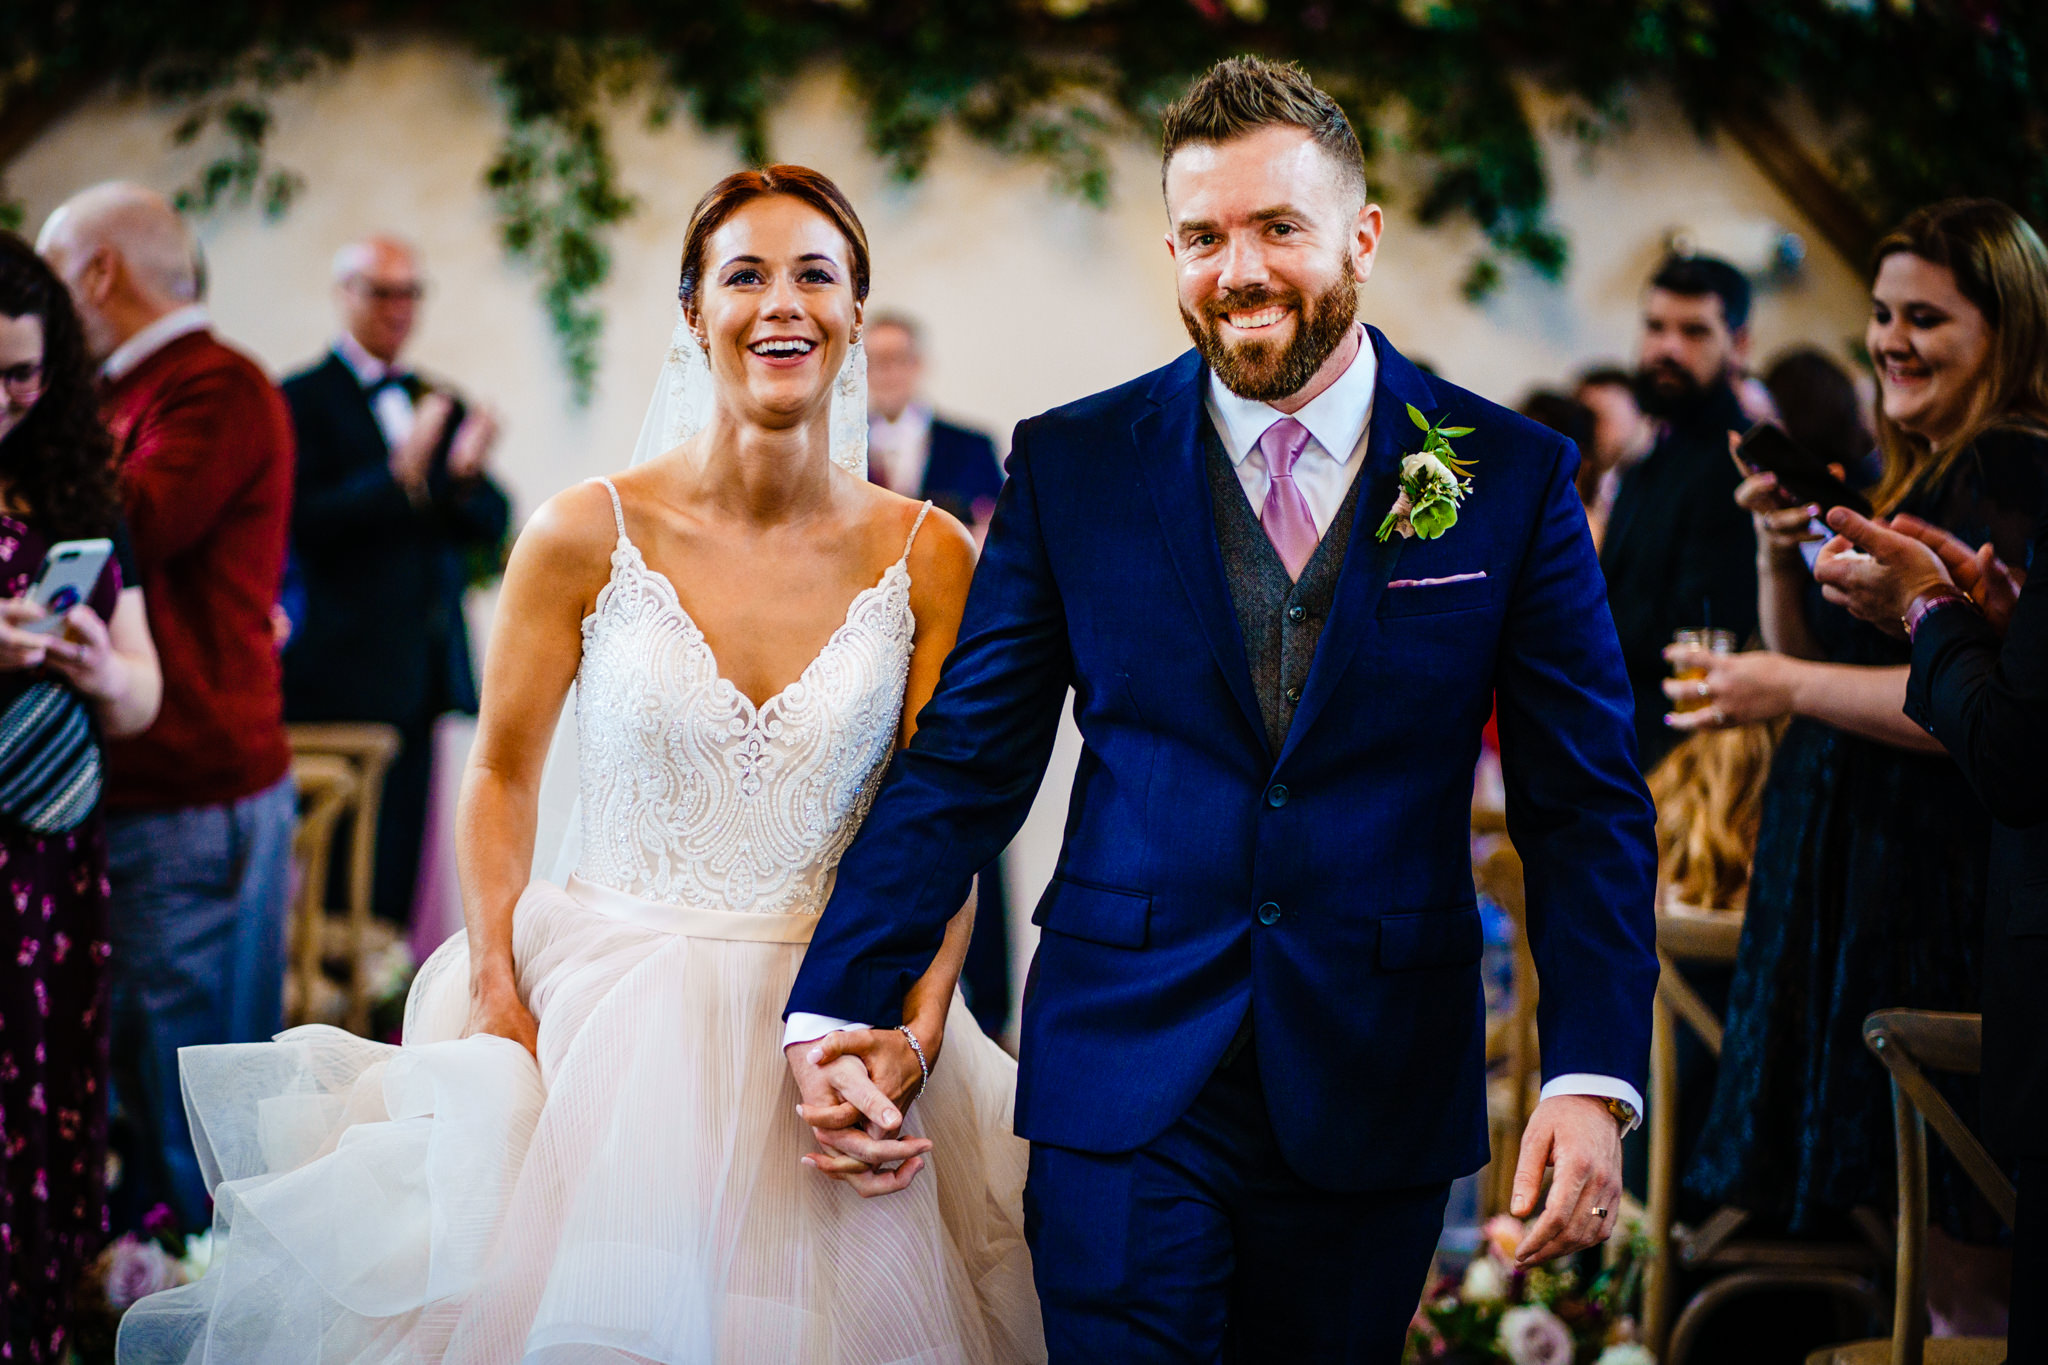 Emily&Ron-Chapel-hill-wedding-barn-38.jpg